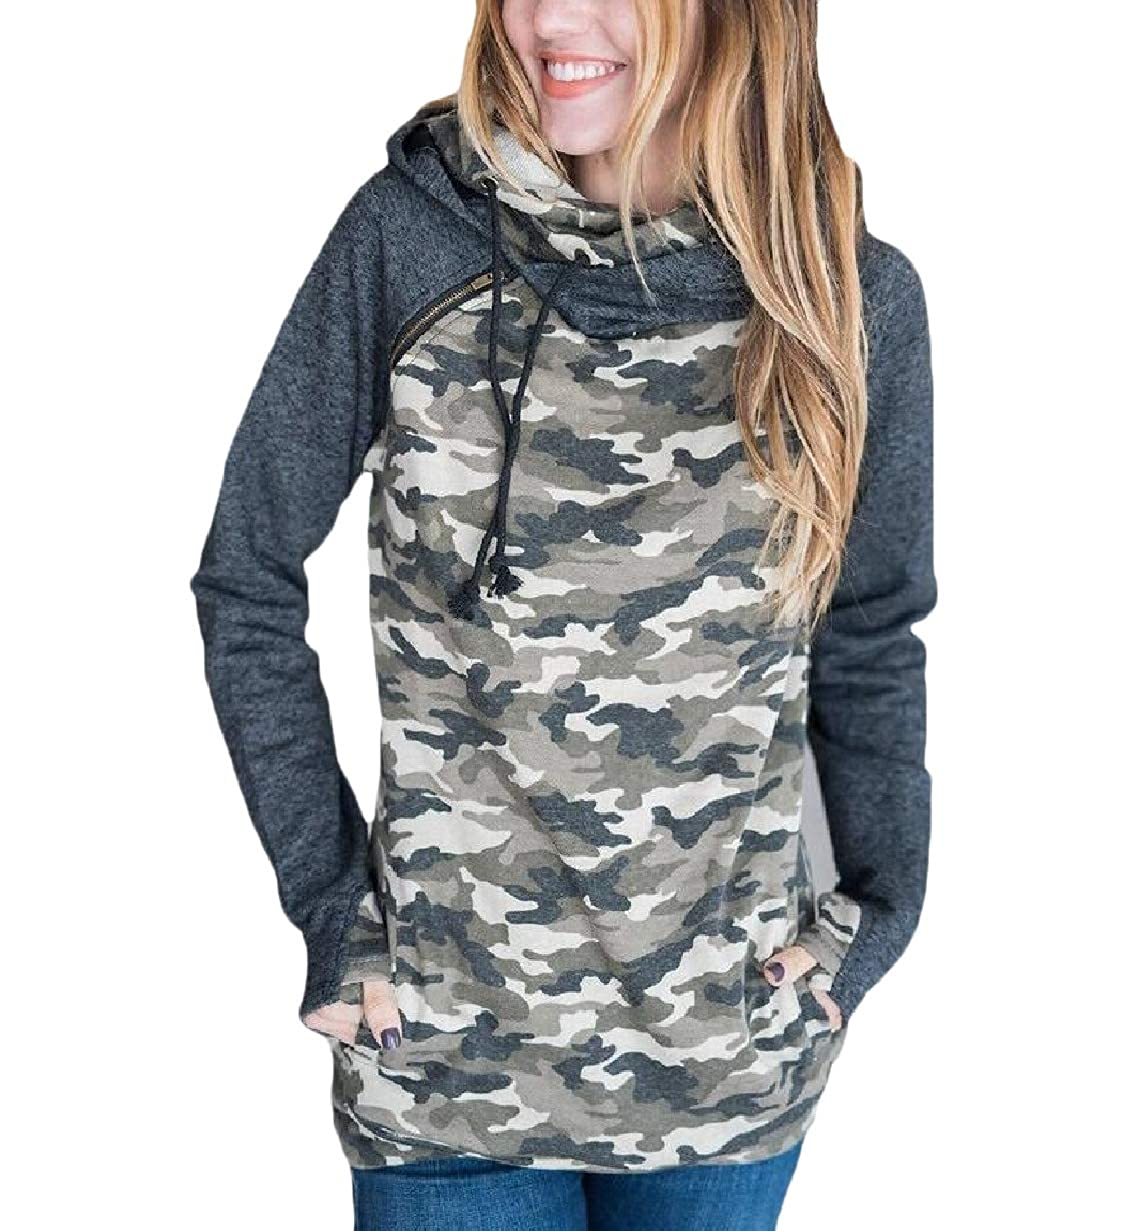 Tootless-Women Cotton Long Sleeve Pocket Hood Winter Pullover Sweatshirt